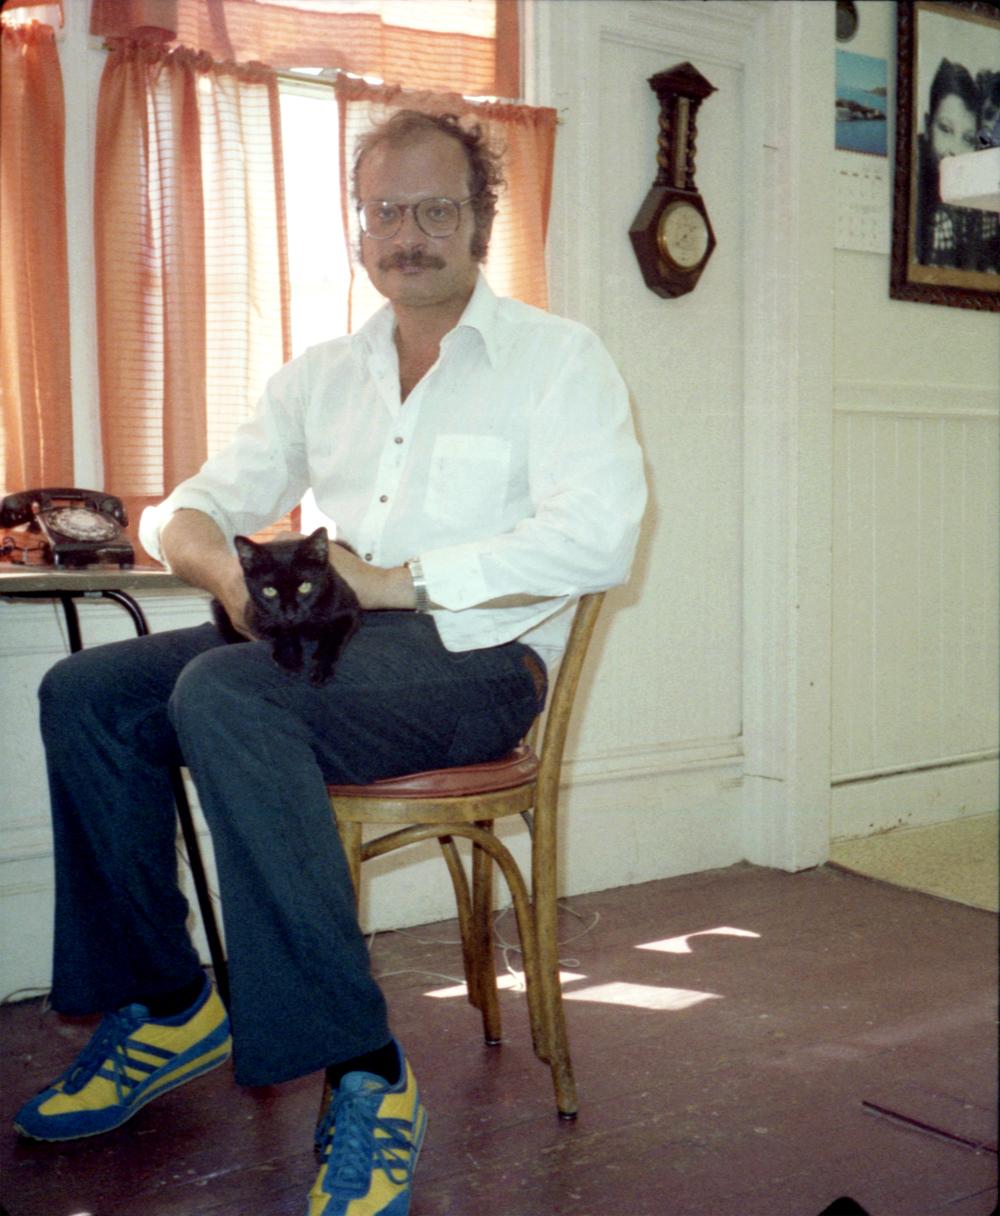 GK photo with cat.jpg